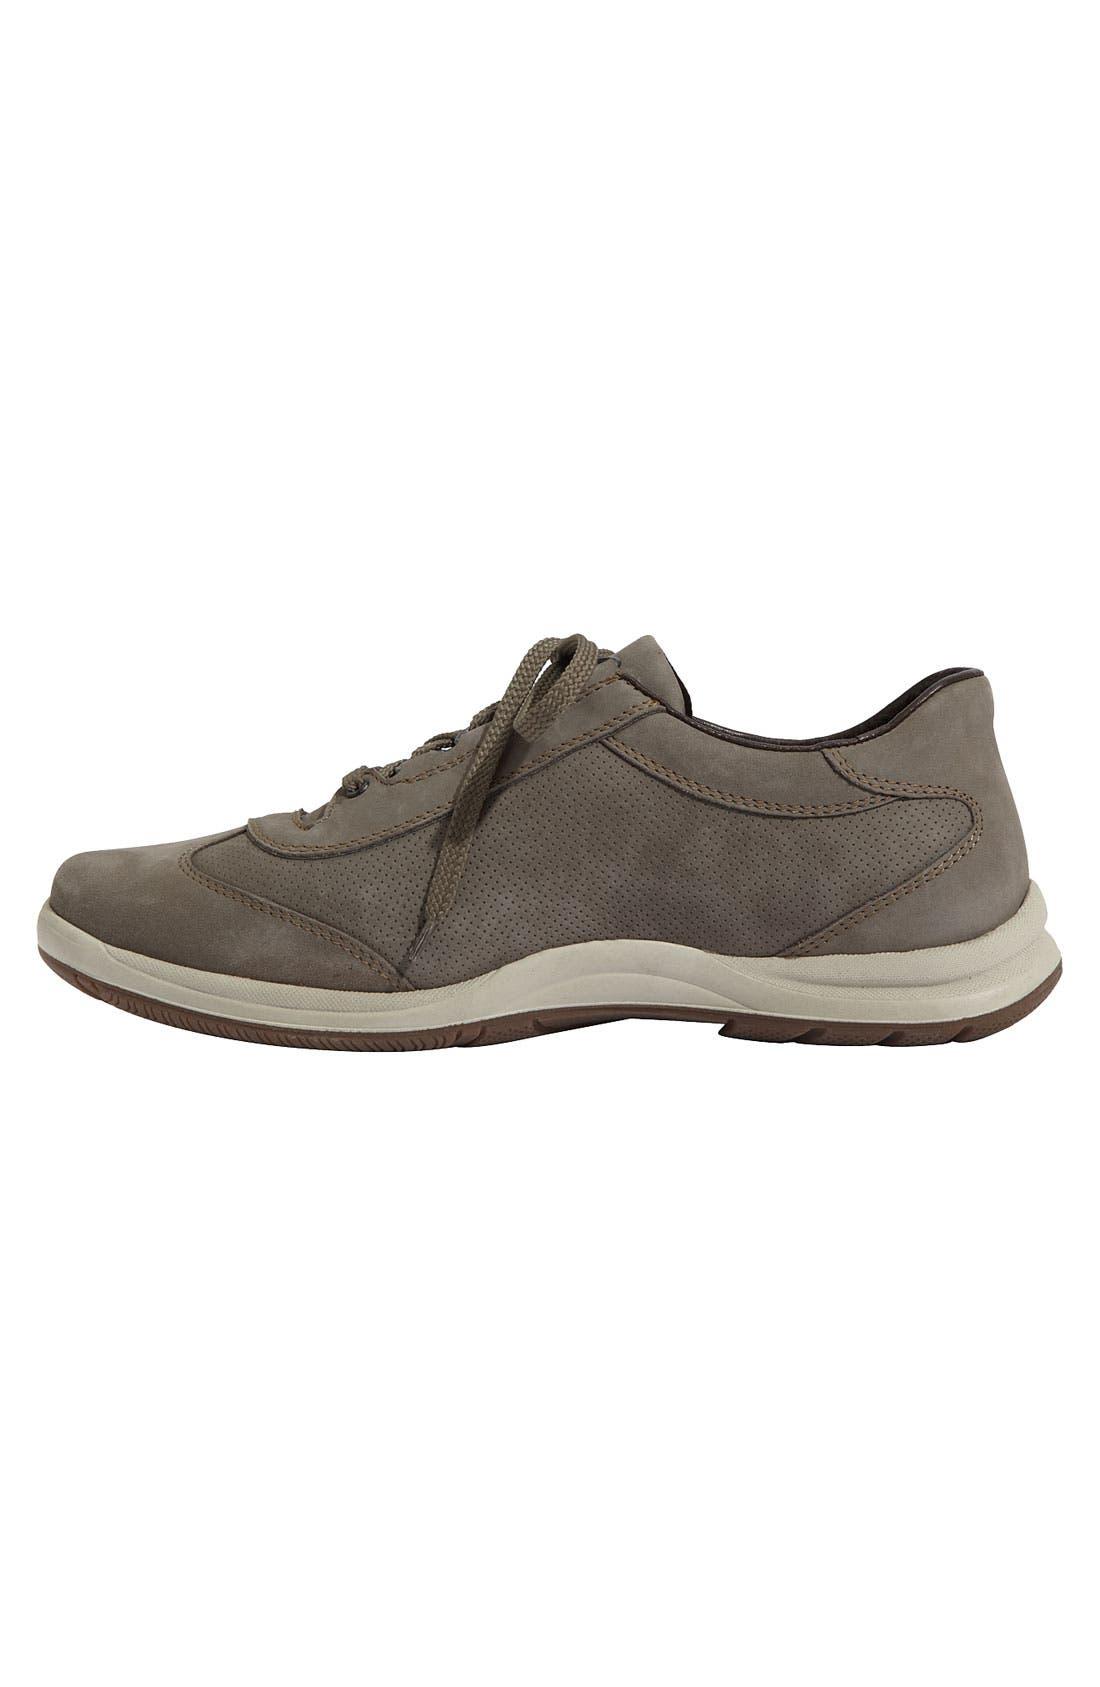 'Hike' Perforated Walking Shoe,                             Alternate thumbnail 3, color,                             020